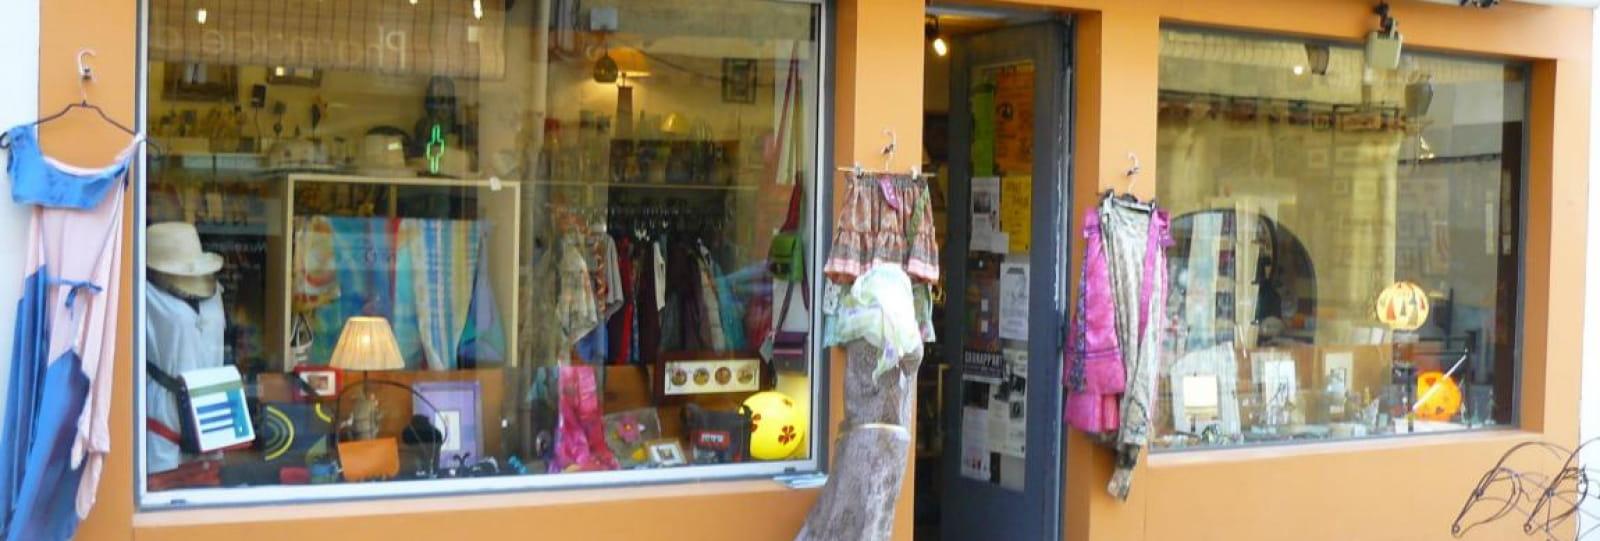 Boutique Galerie Girouette